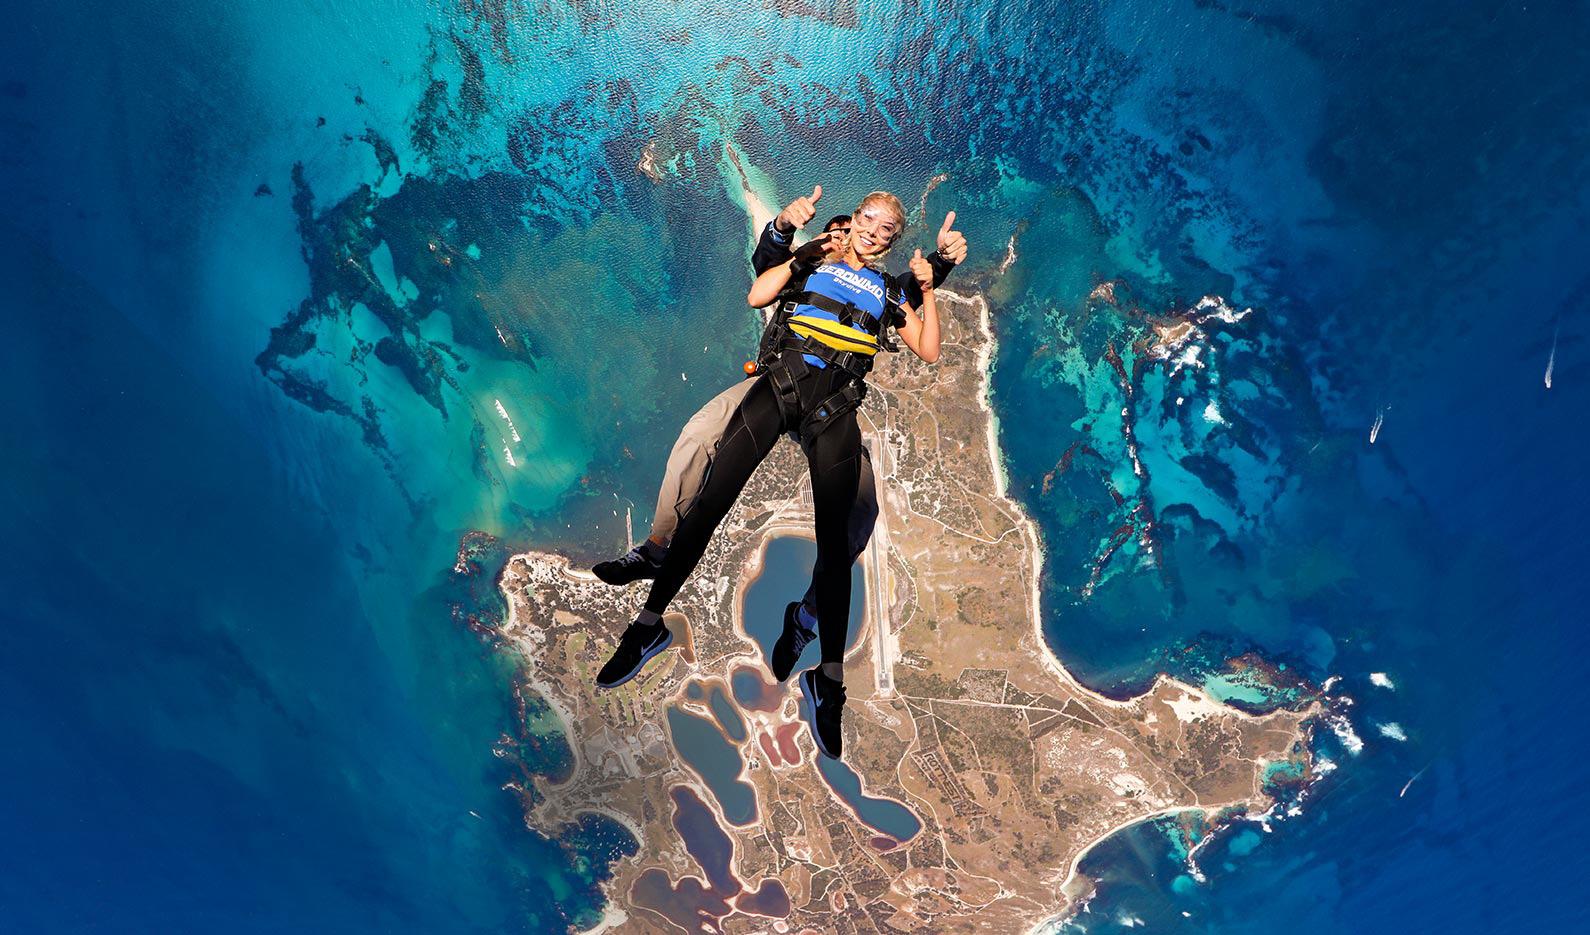 Skydiving over Rottnest Island